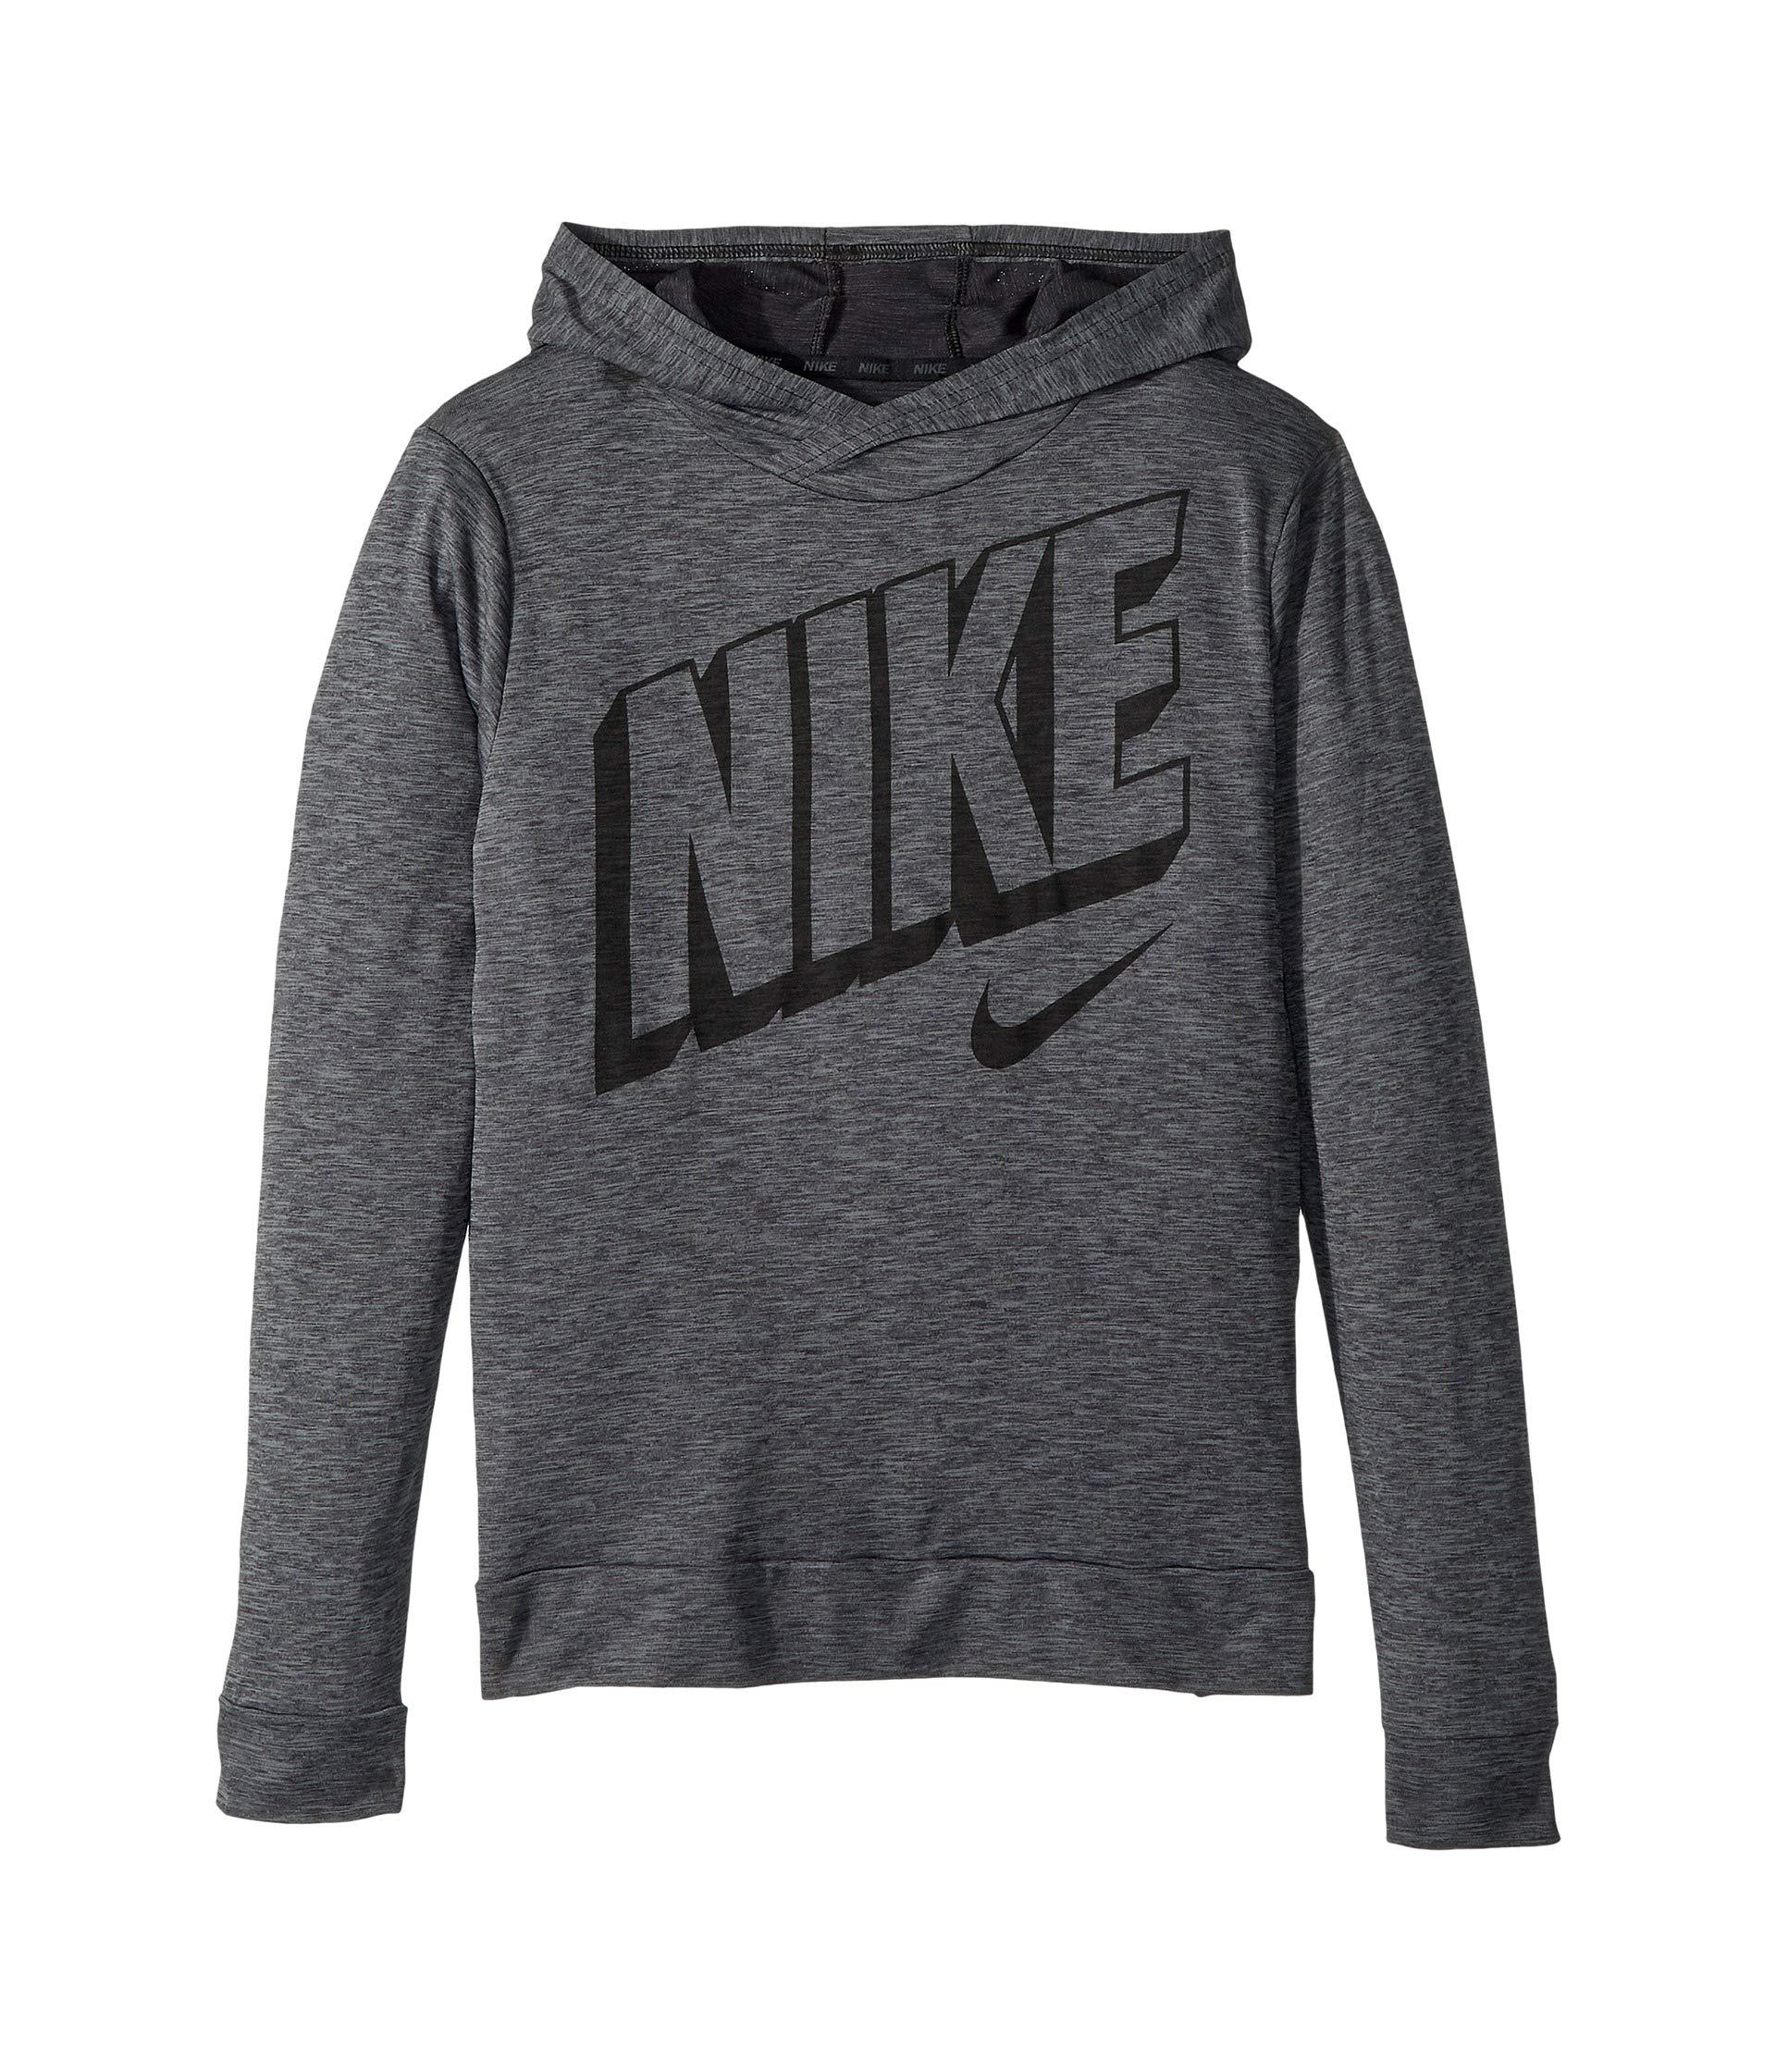 Nike Boy's Breathe Graphic Hoodie (Black/Cool Grey, Large)